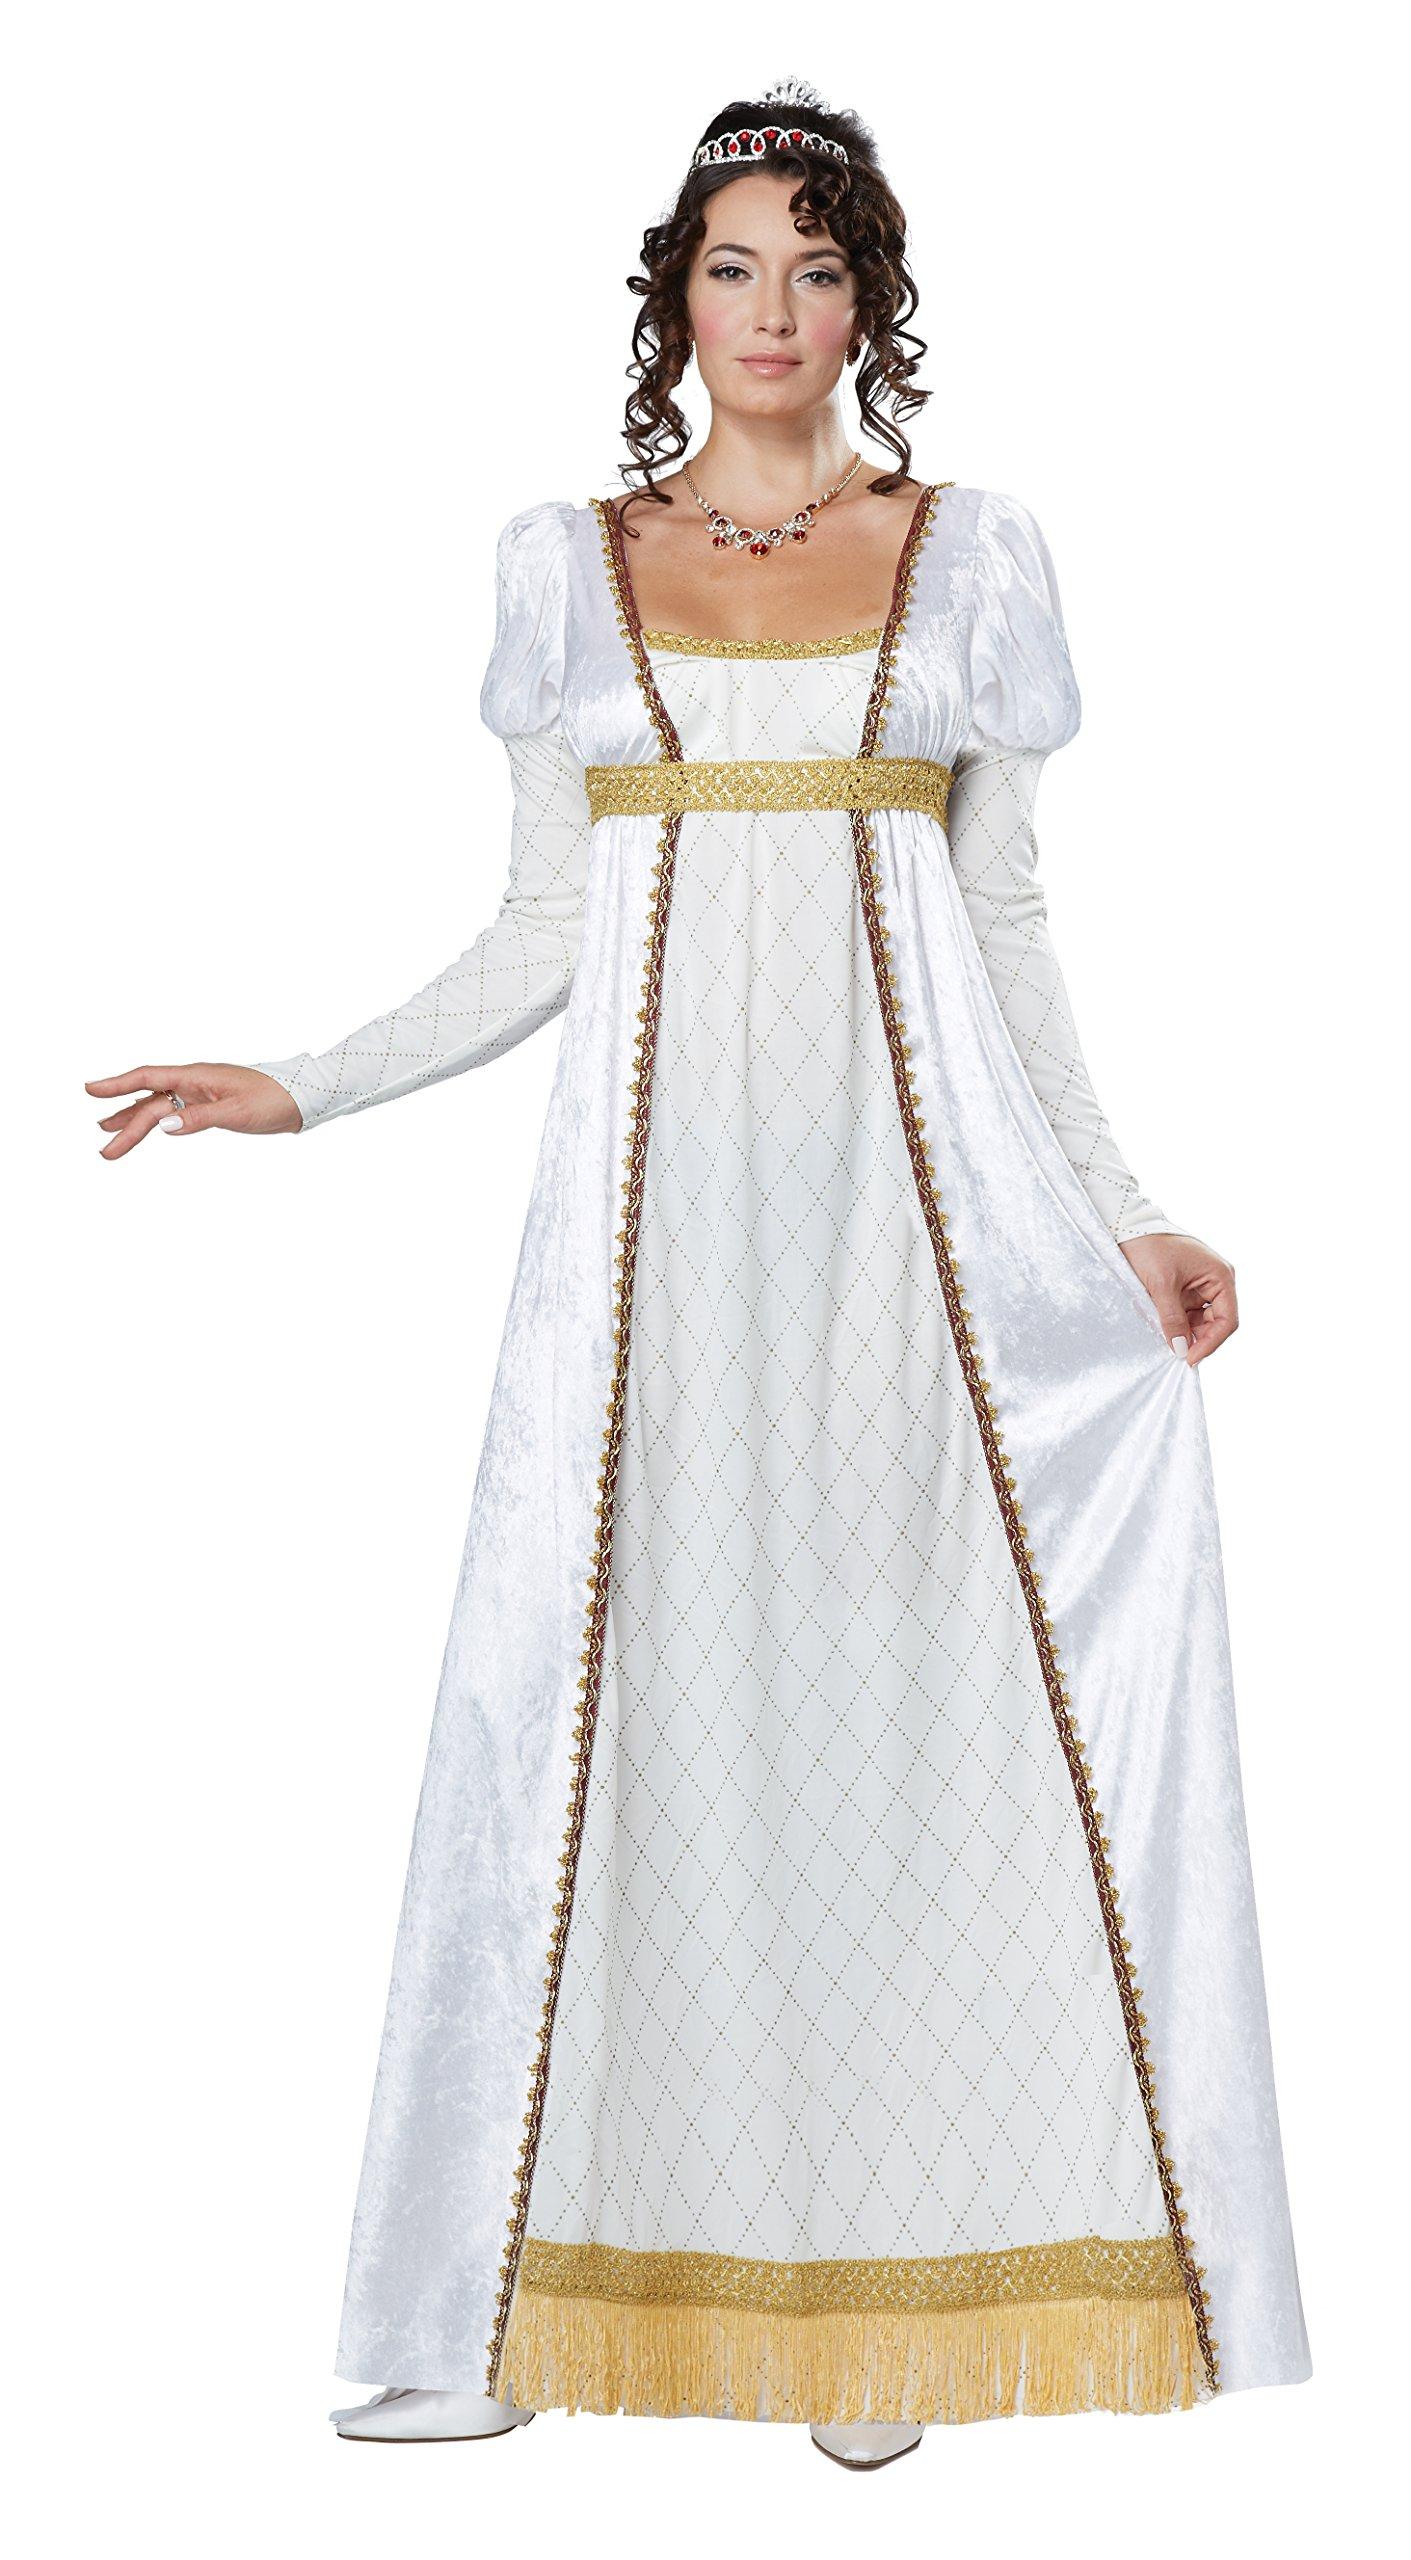 California Costumes Women's Josephine French Empress Costume, White/Gold, Small